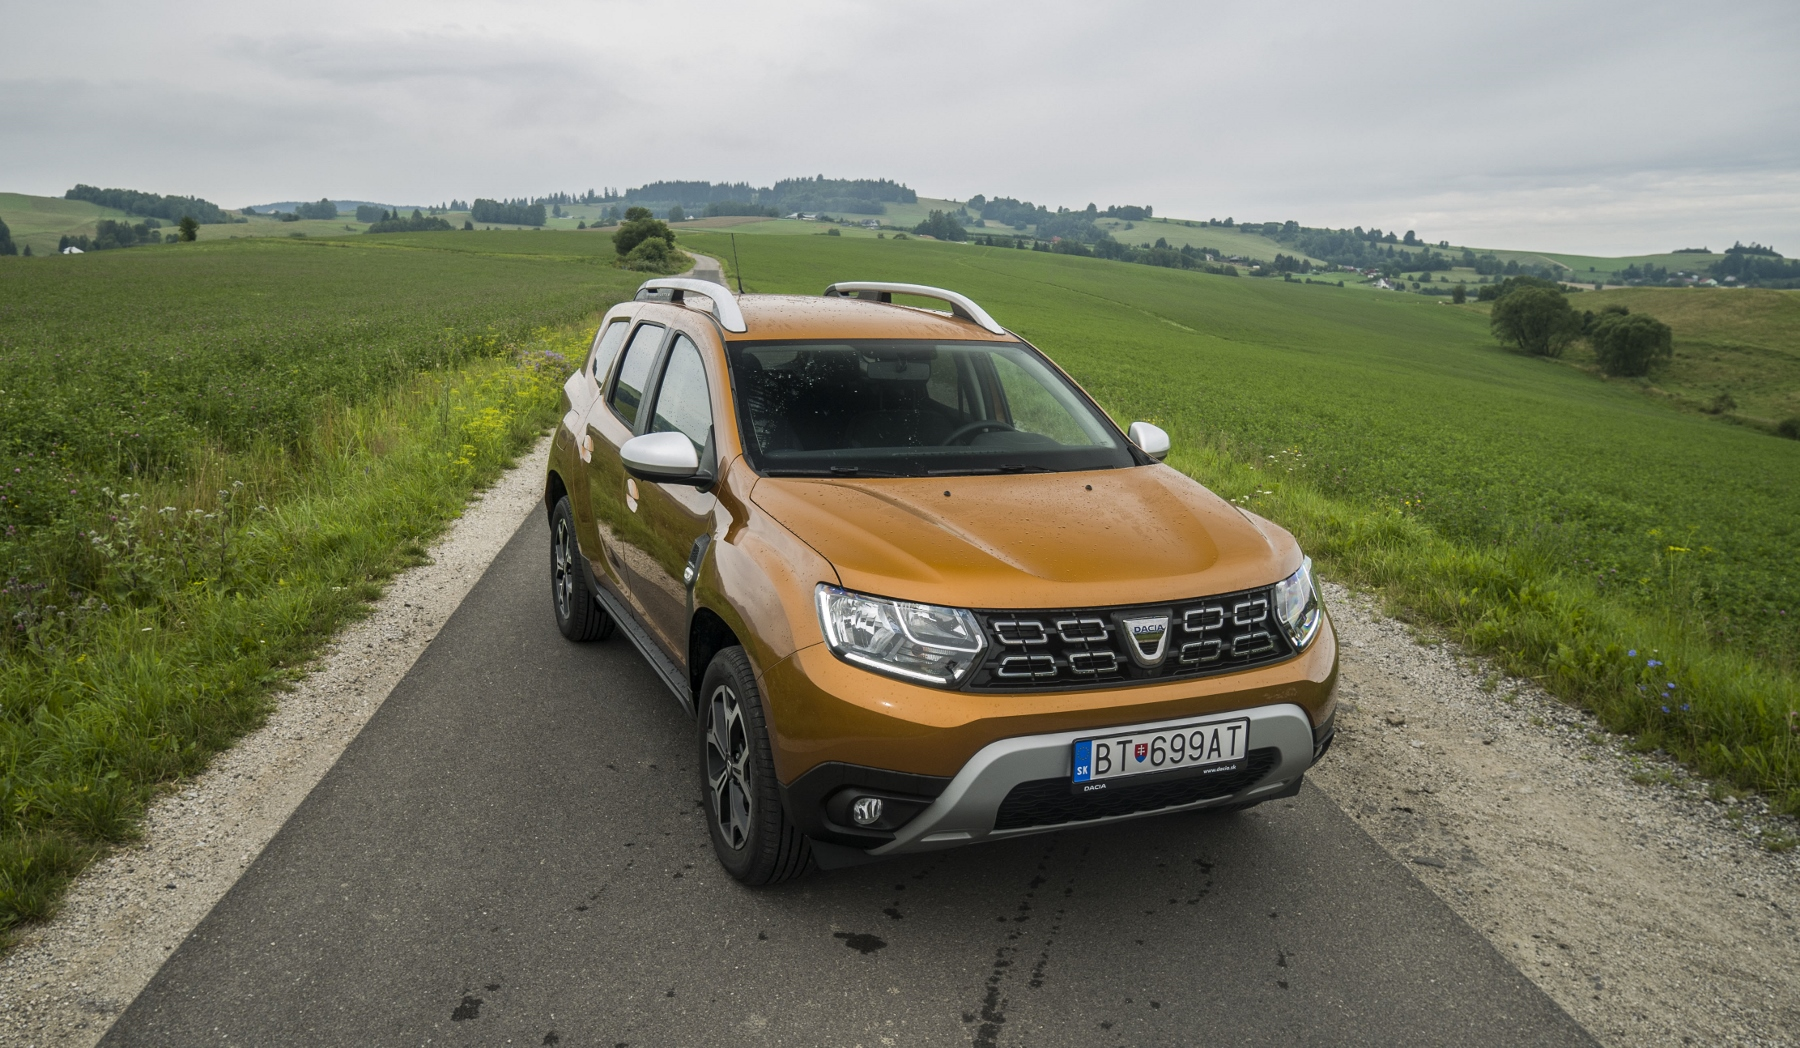 Test: Dacia Duster LPG je voľbou rozumu h6QLVtf67L dacia-duster-lpg-1